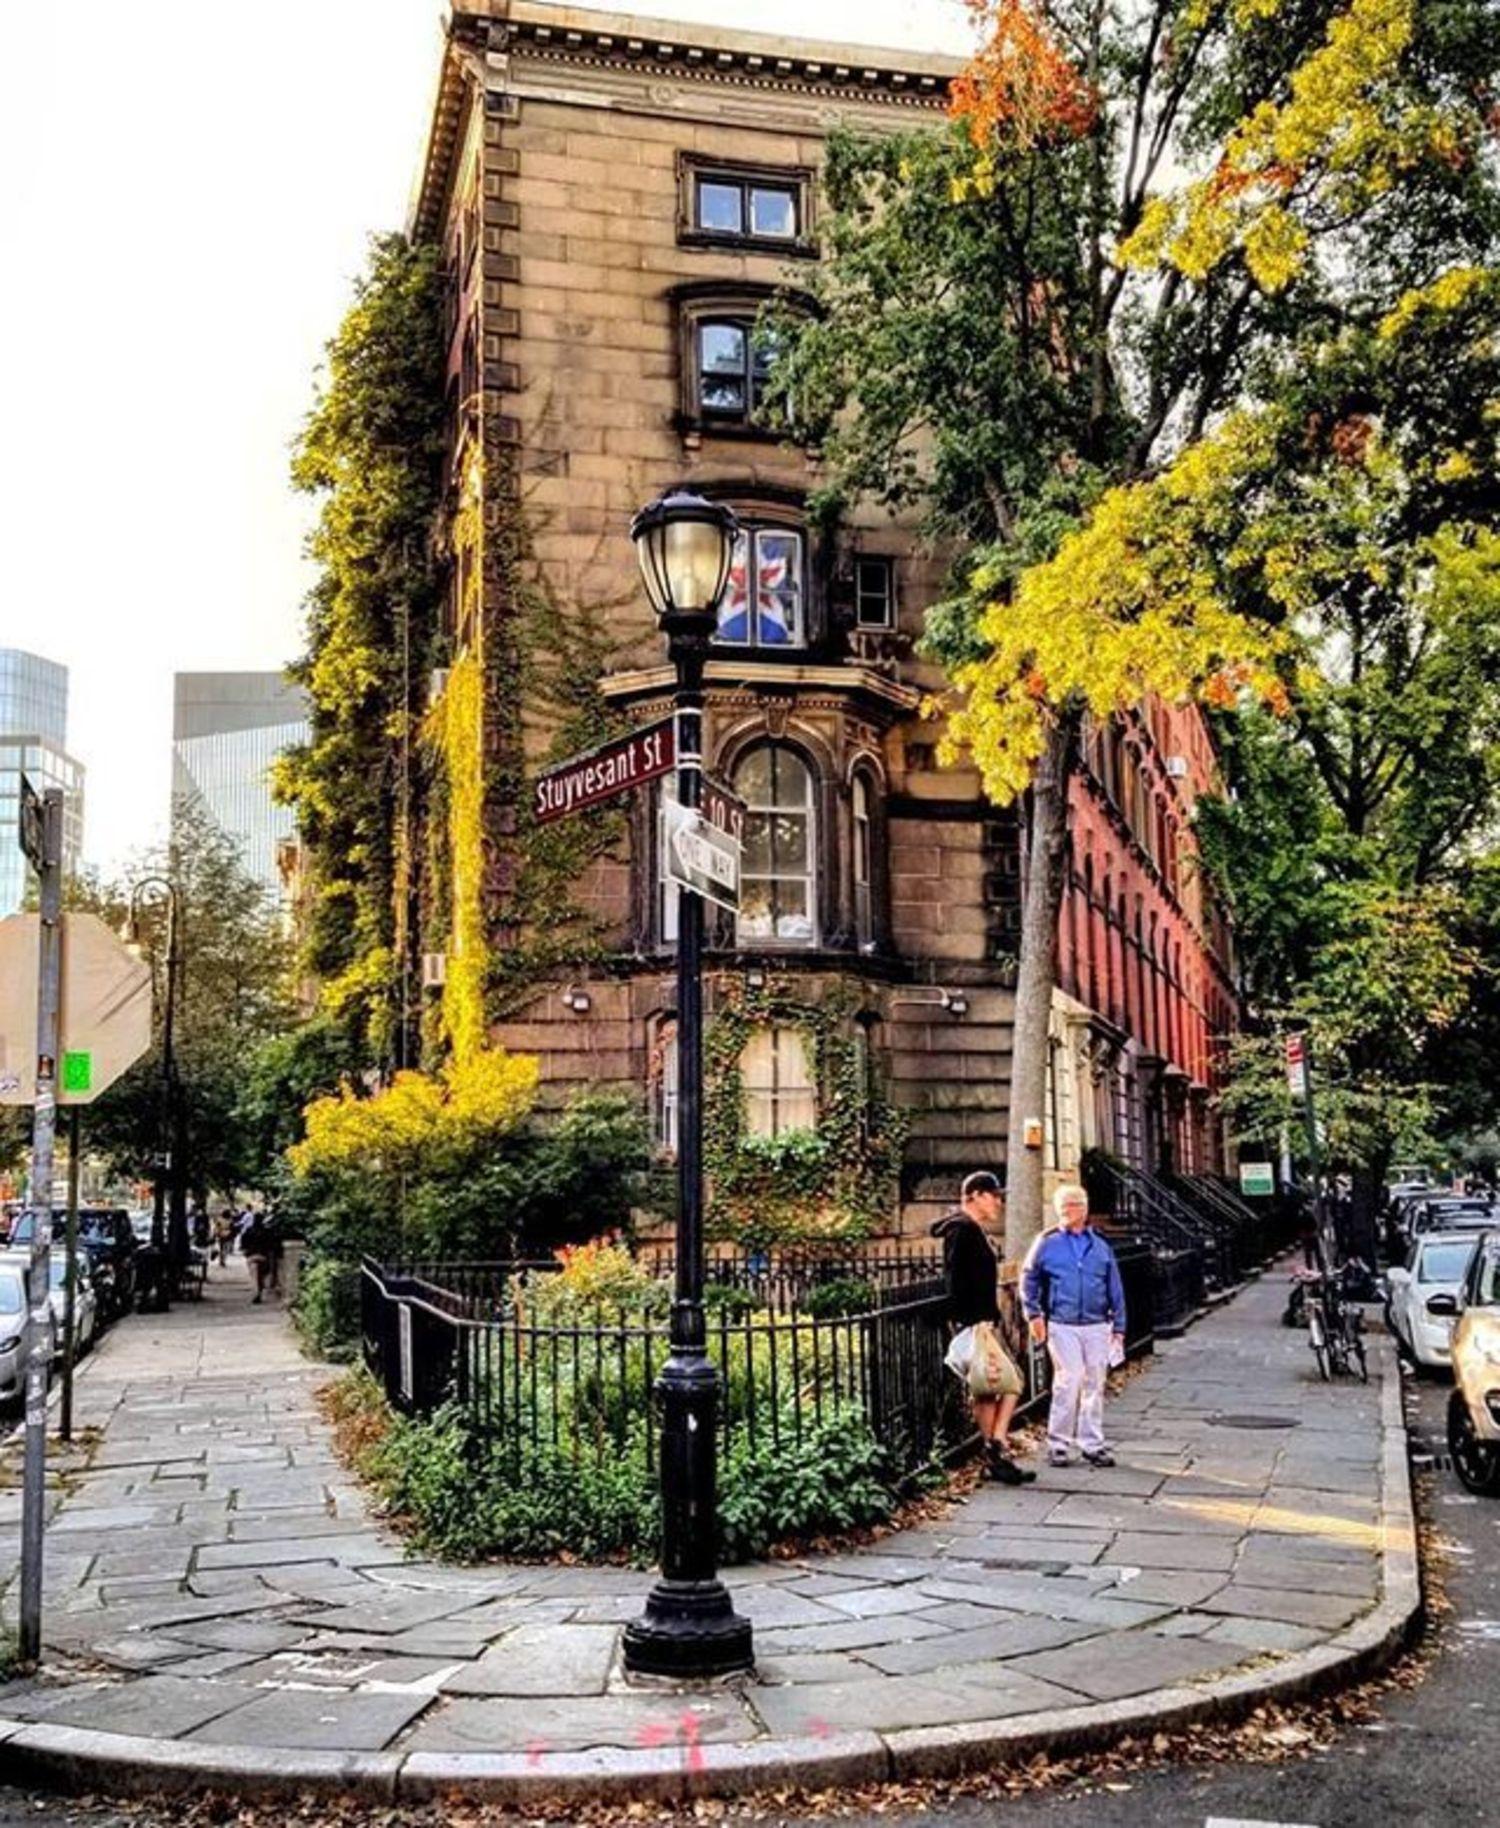 Ave Lebewohl Triangle, East Village, Manhattan. Photo via @qwqw7575 #viewingnyc #newyork #newyorkcity #nyc #abelebewohlpark #abelebewohltriangle